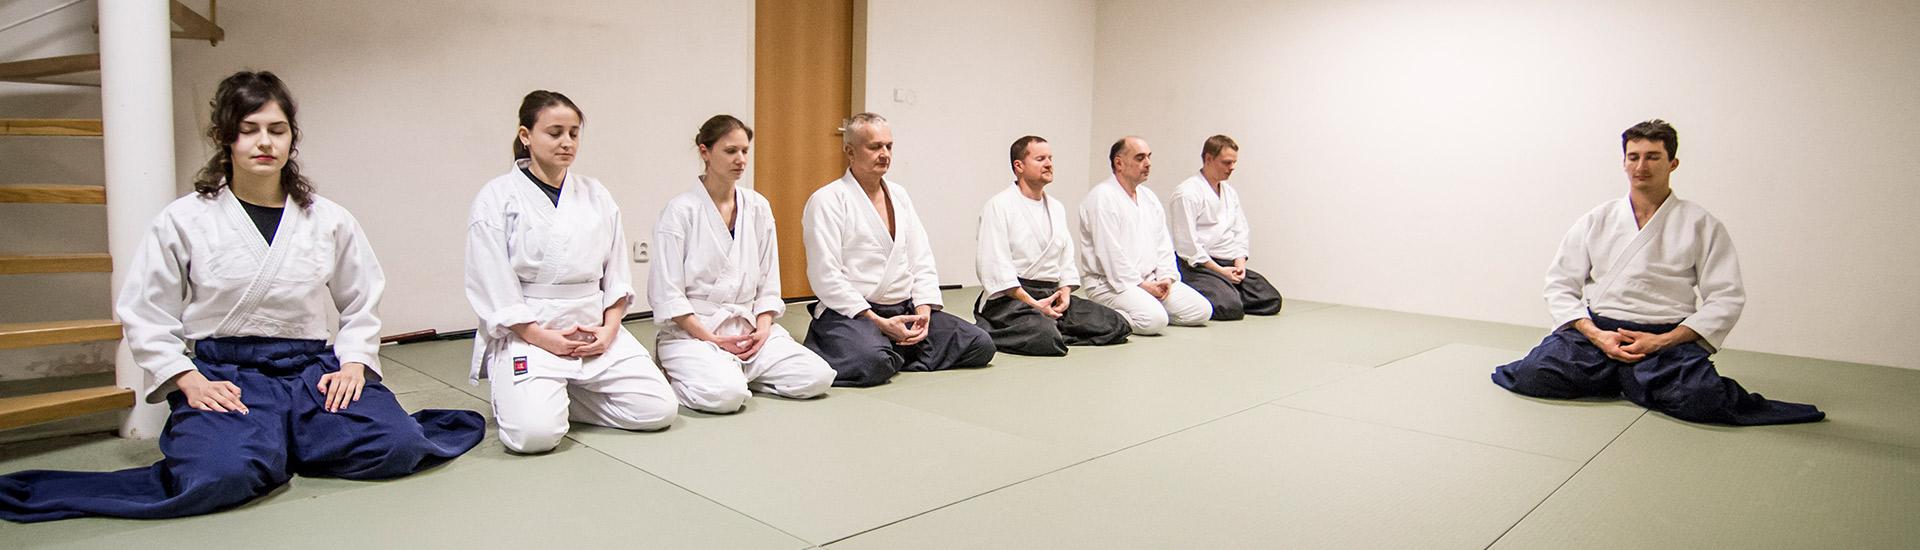 aikido01-header-aikido-kobukan